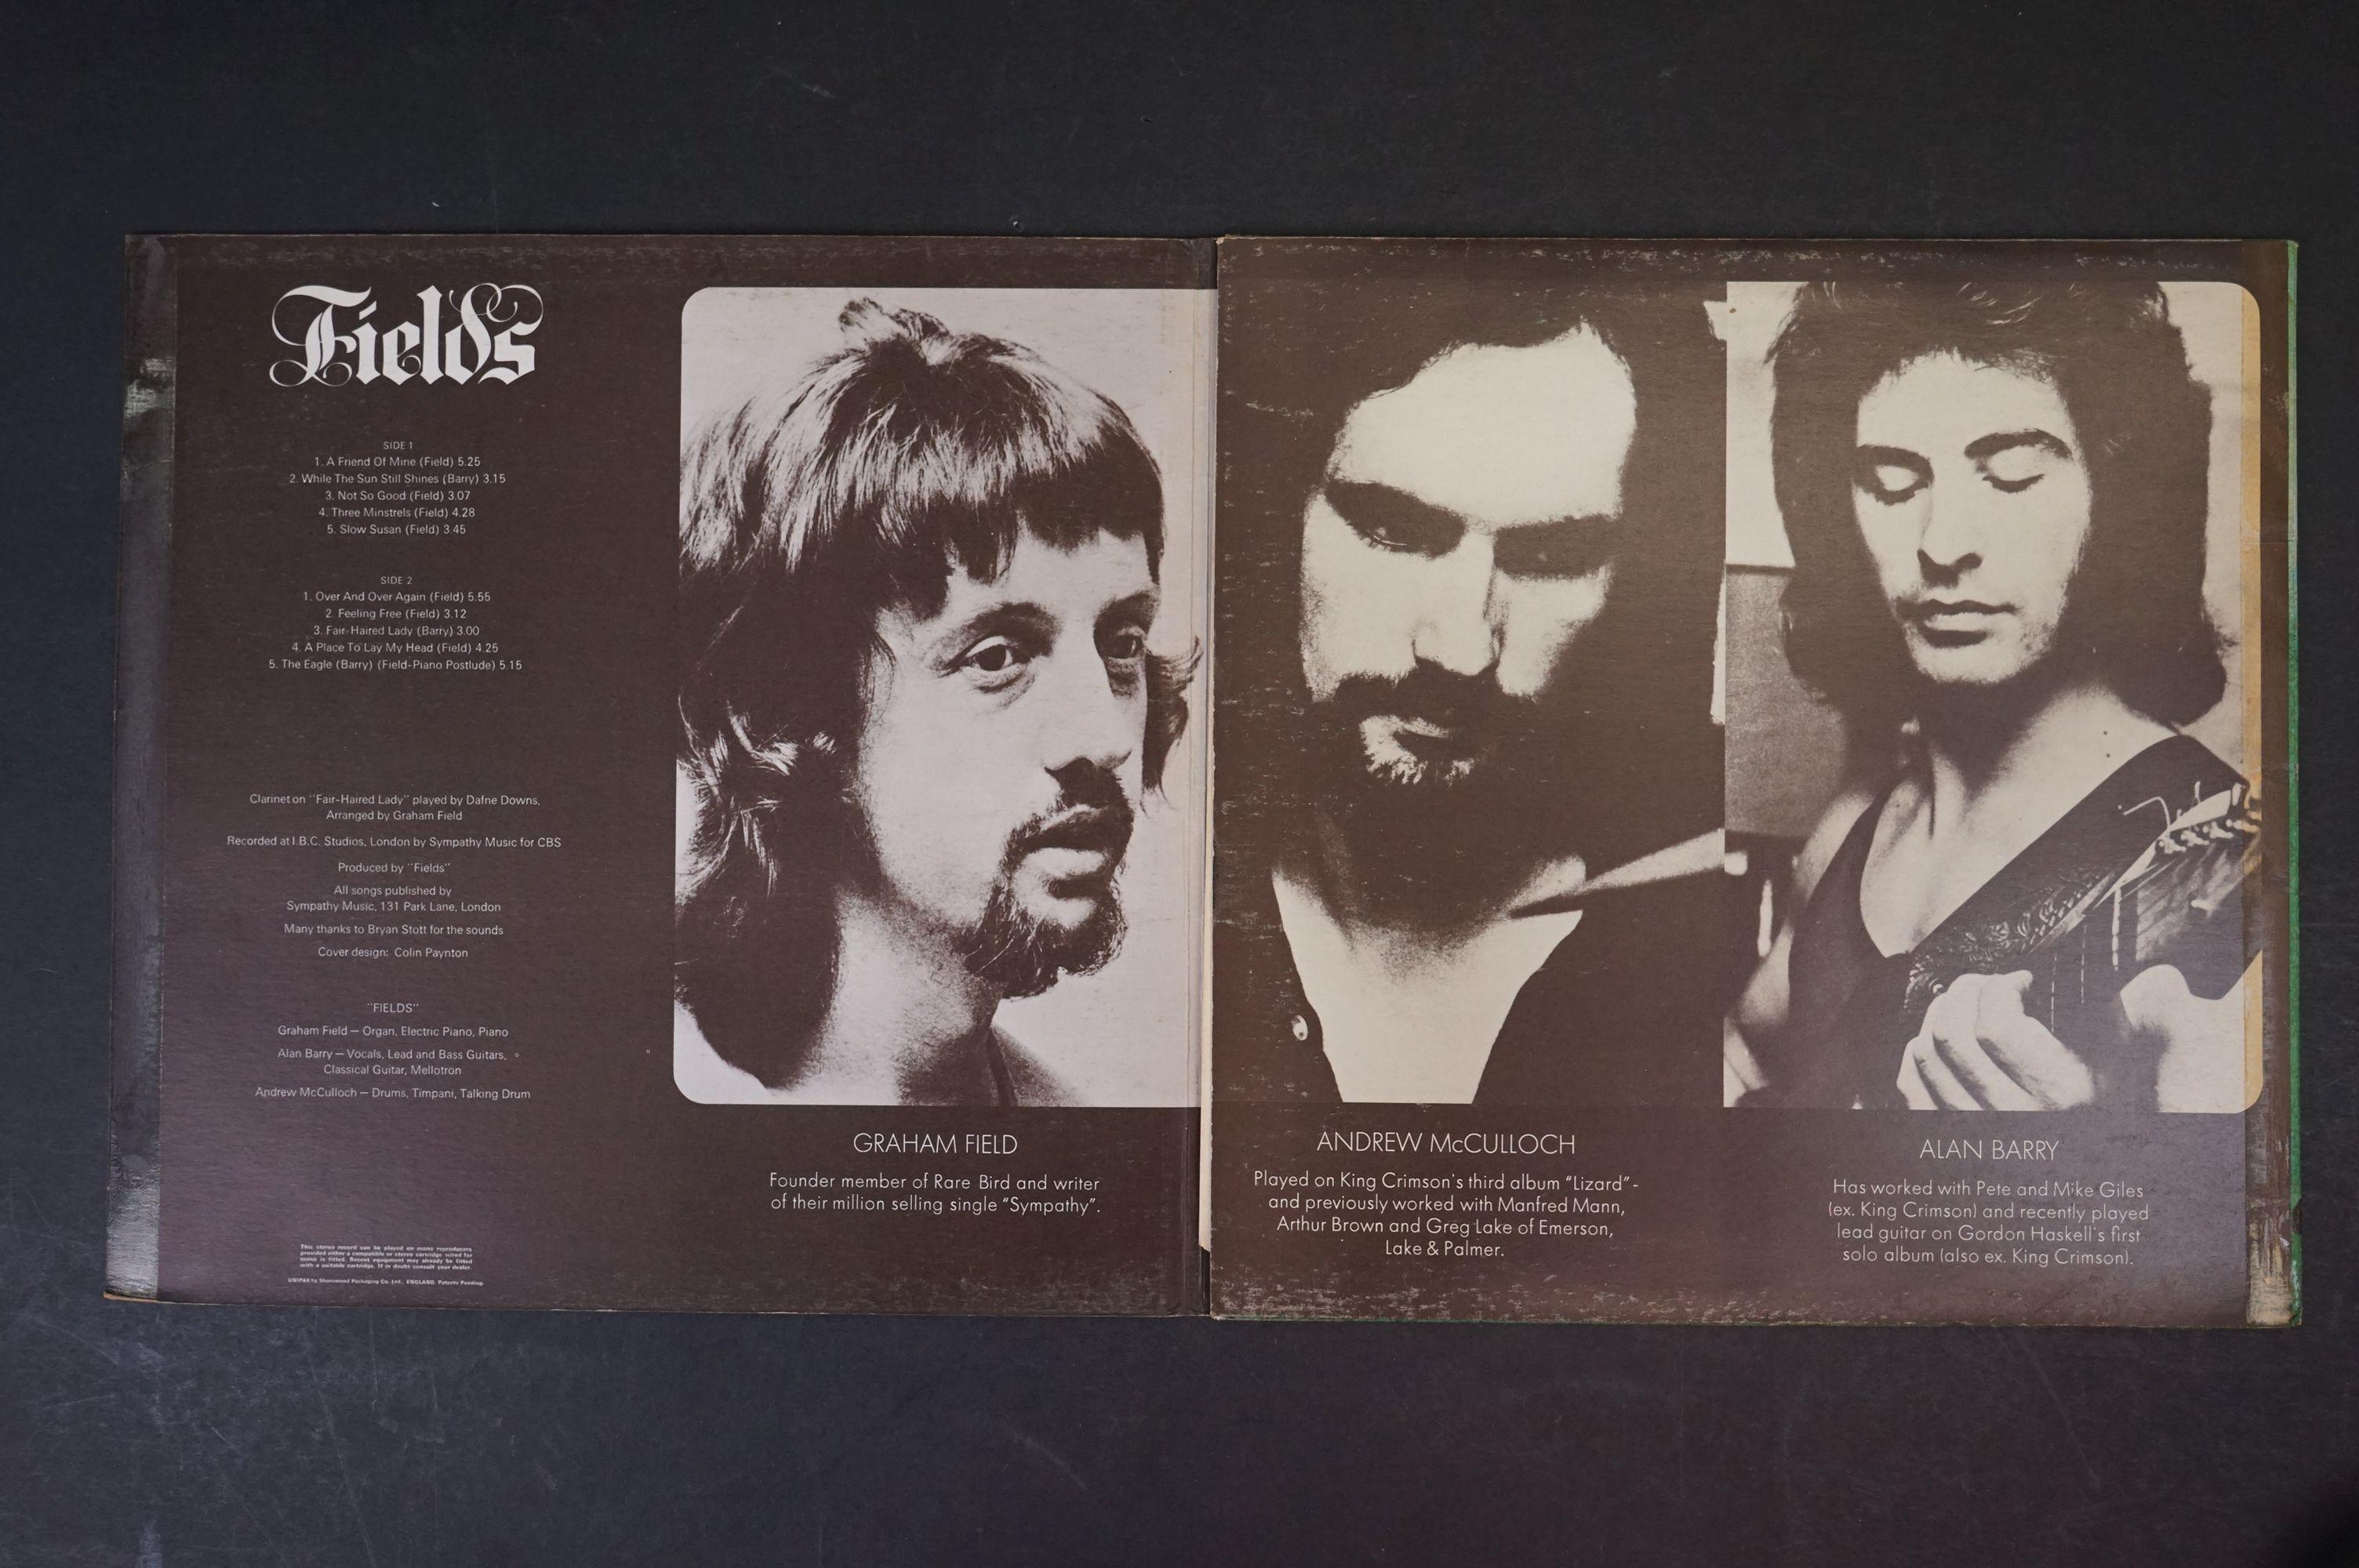 Vinyl - Prog Rock - Fields - Fields. UK 1st 1971 pressing with scarce poster, gatefold sleeve is - Image 2 of 6